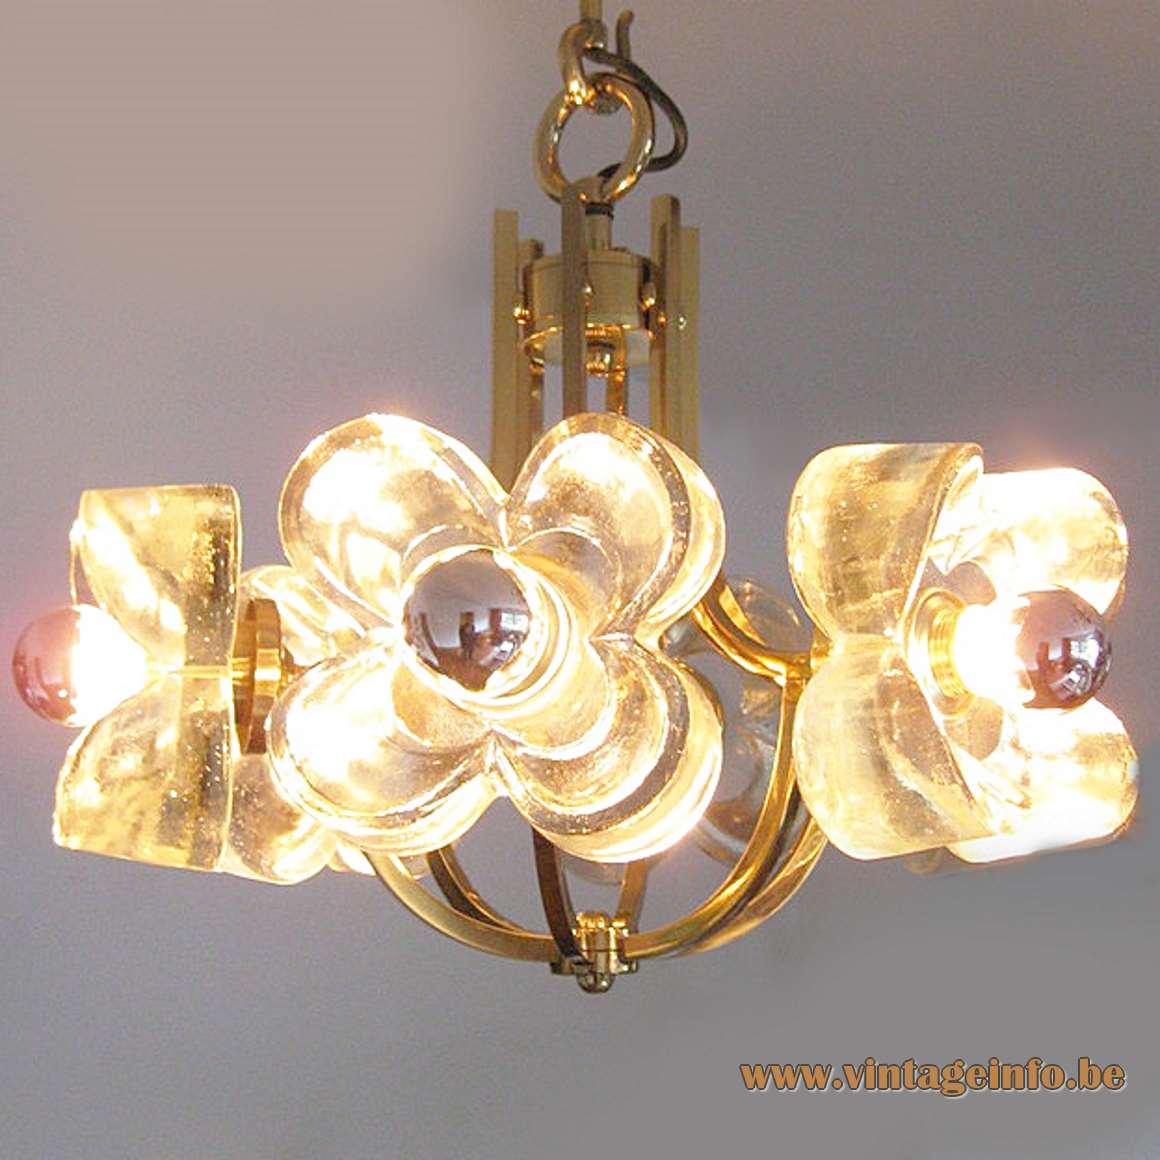 Simon & Schelle - Sische - 1980s Flower Pendant Lamp